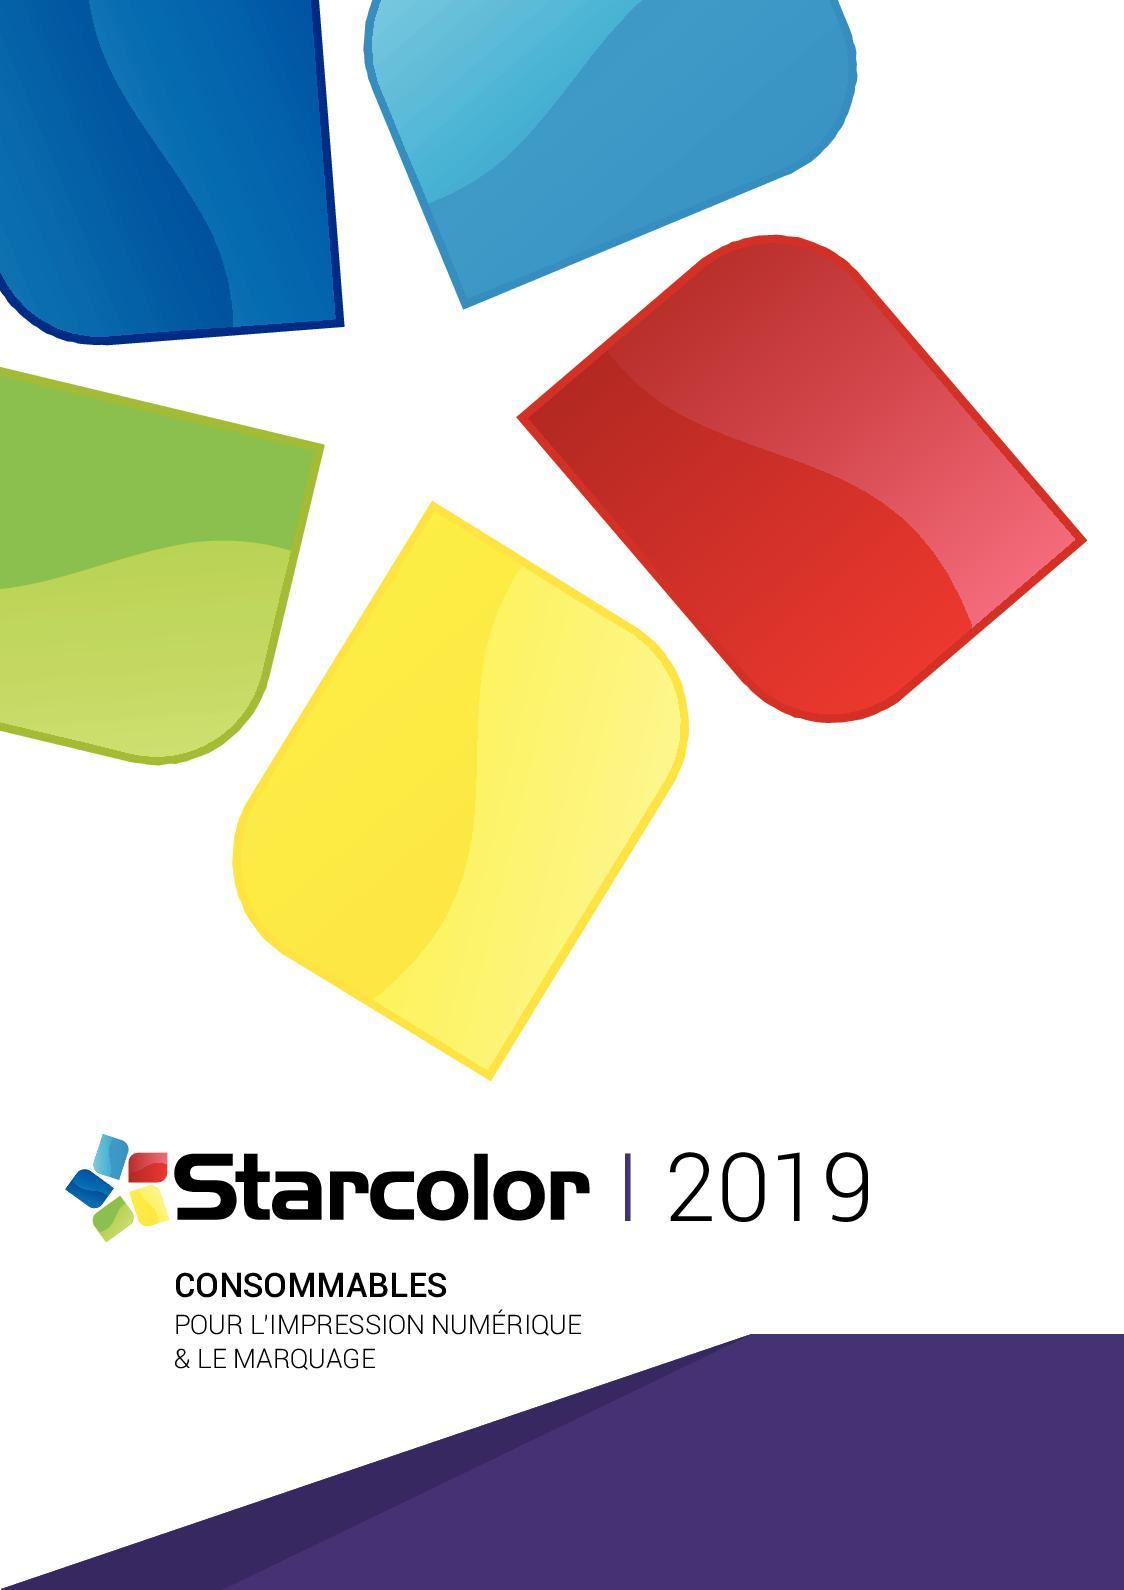 Catalogue Starcolor 2019 Hd